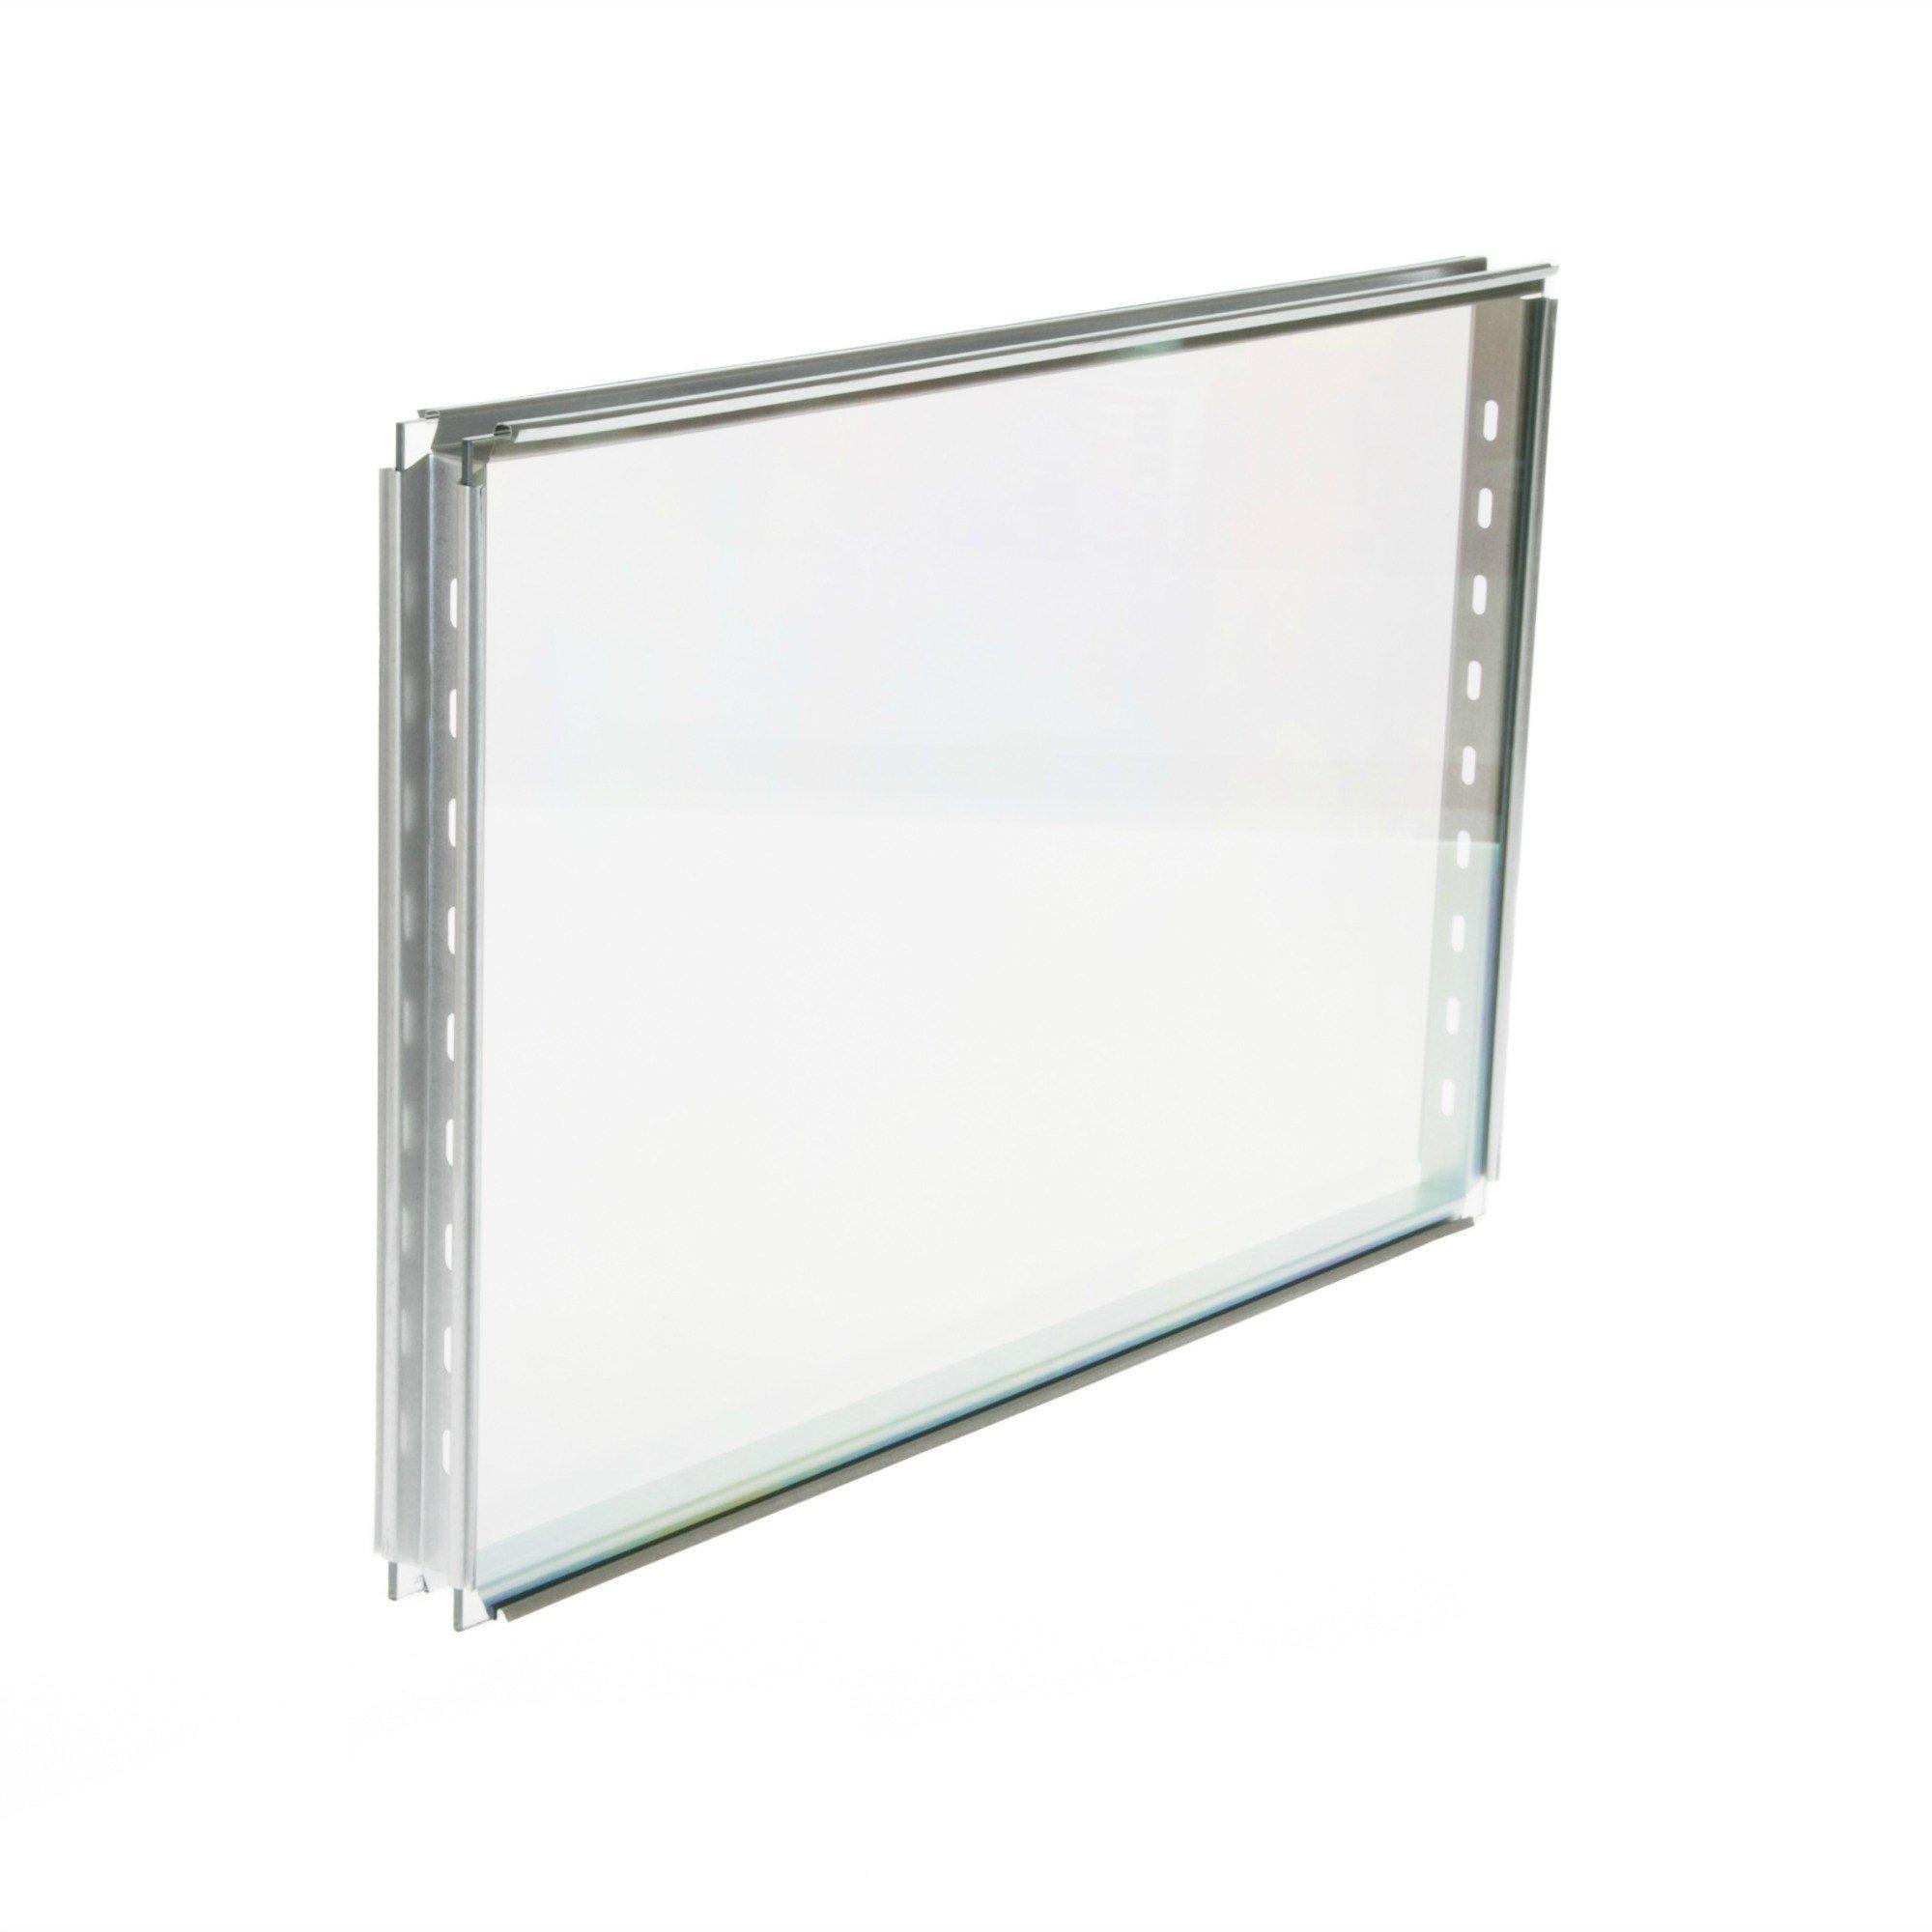 GE WB55T10067 Frame Window Pa